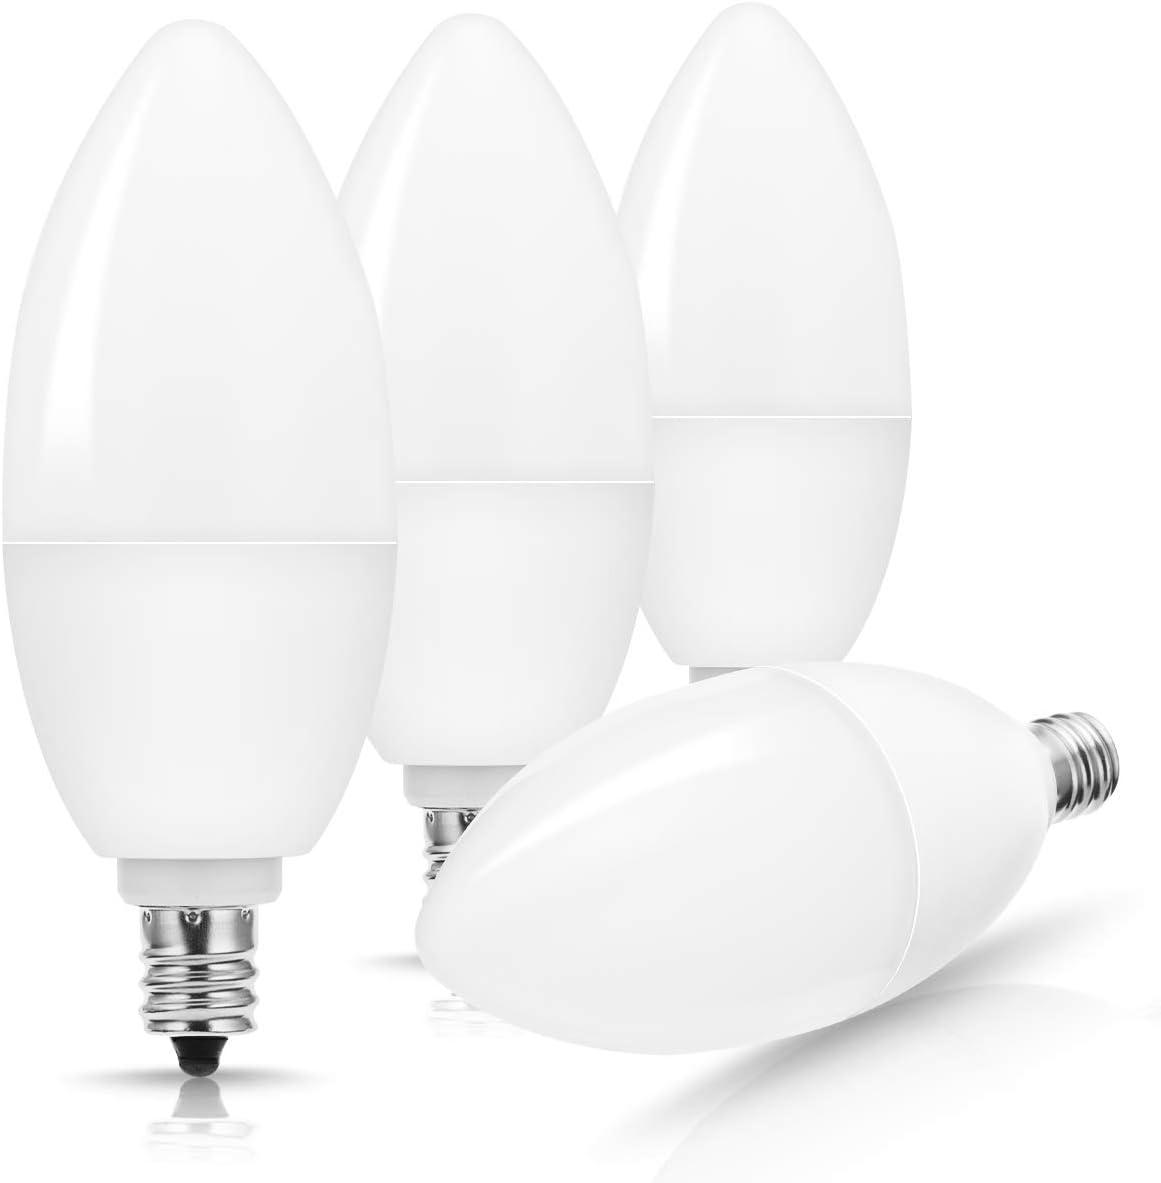 JandCase 4W Candelabra Dimmable Bulb, 35W Equivalent, 350LM Type B Bulb, Daylight White 5000K, Torpedo Bulb for Home Lighting, Chandelier, Bathroom, E12 Candelabra Base, 4 Pack